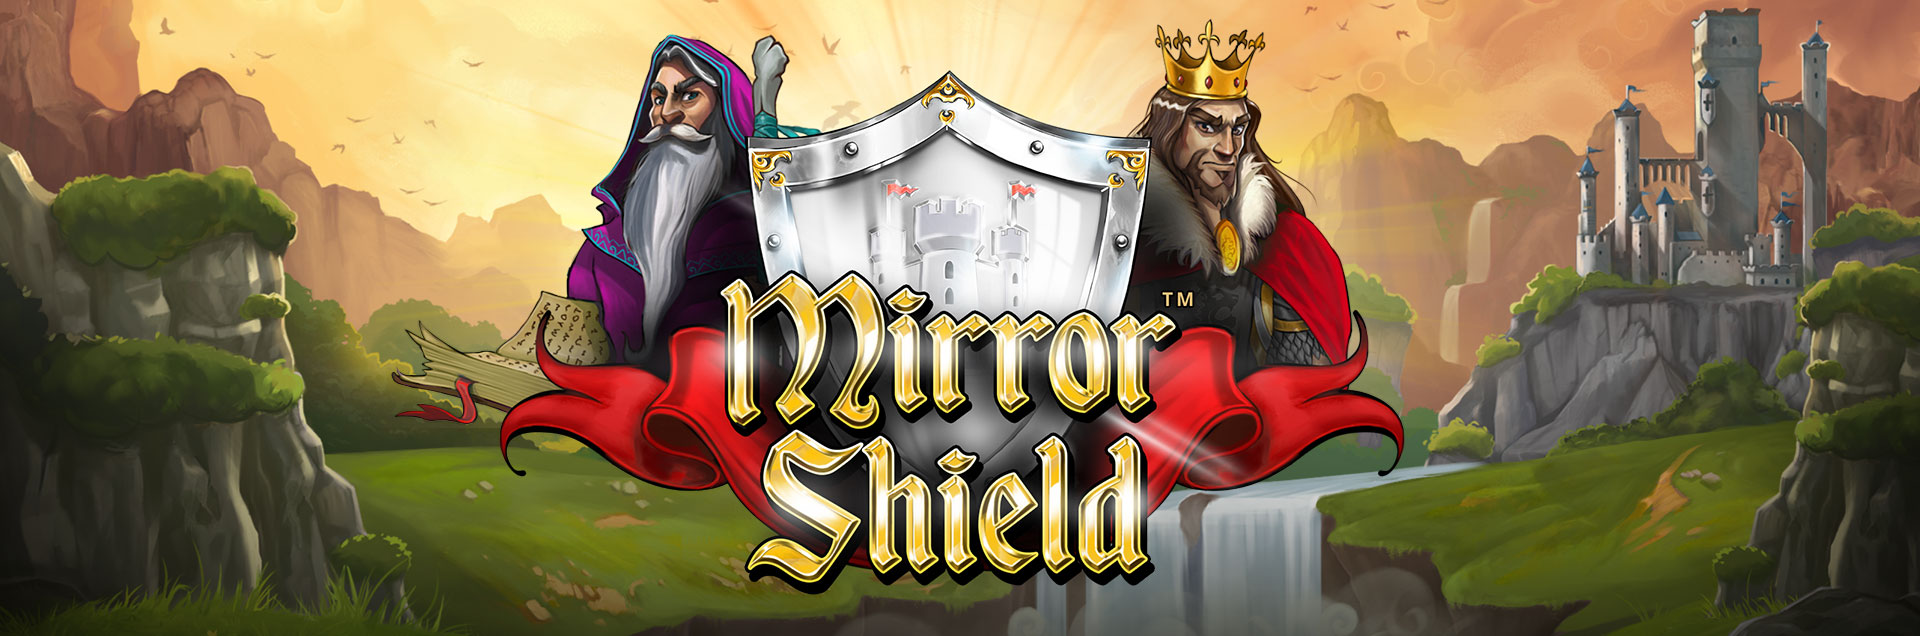 MirrorShield Image2